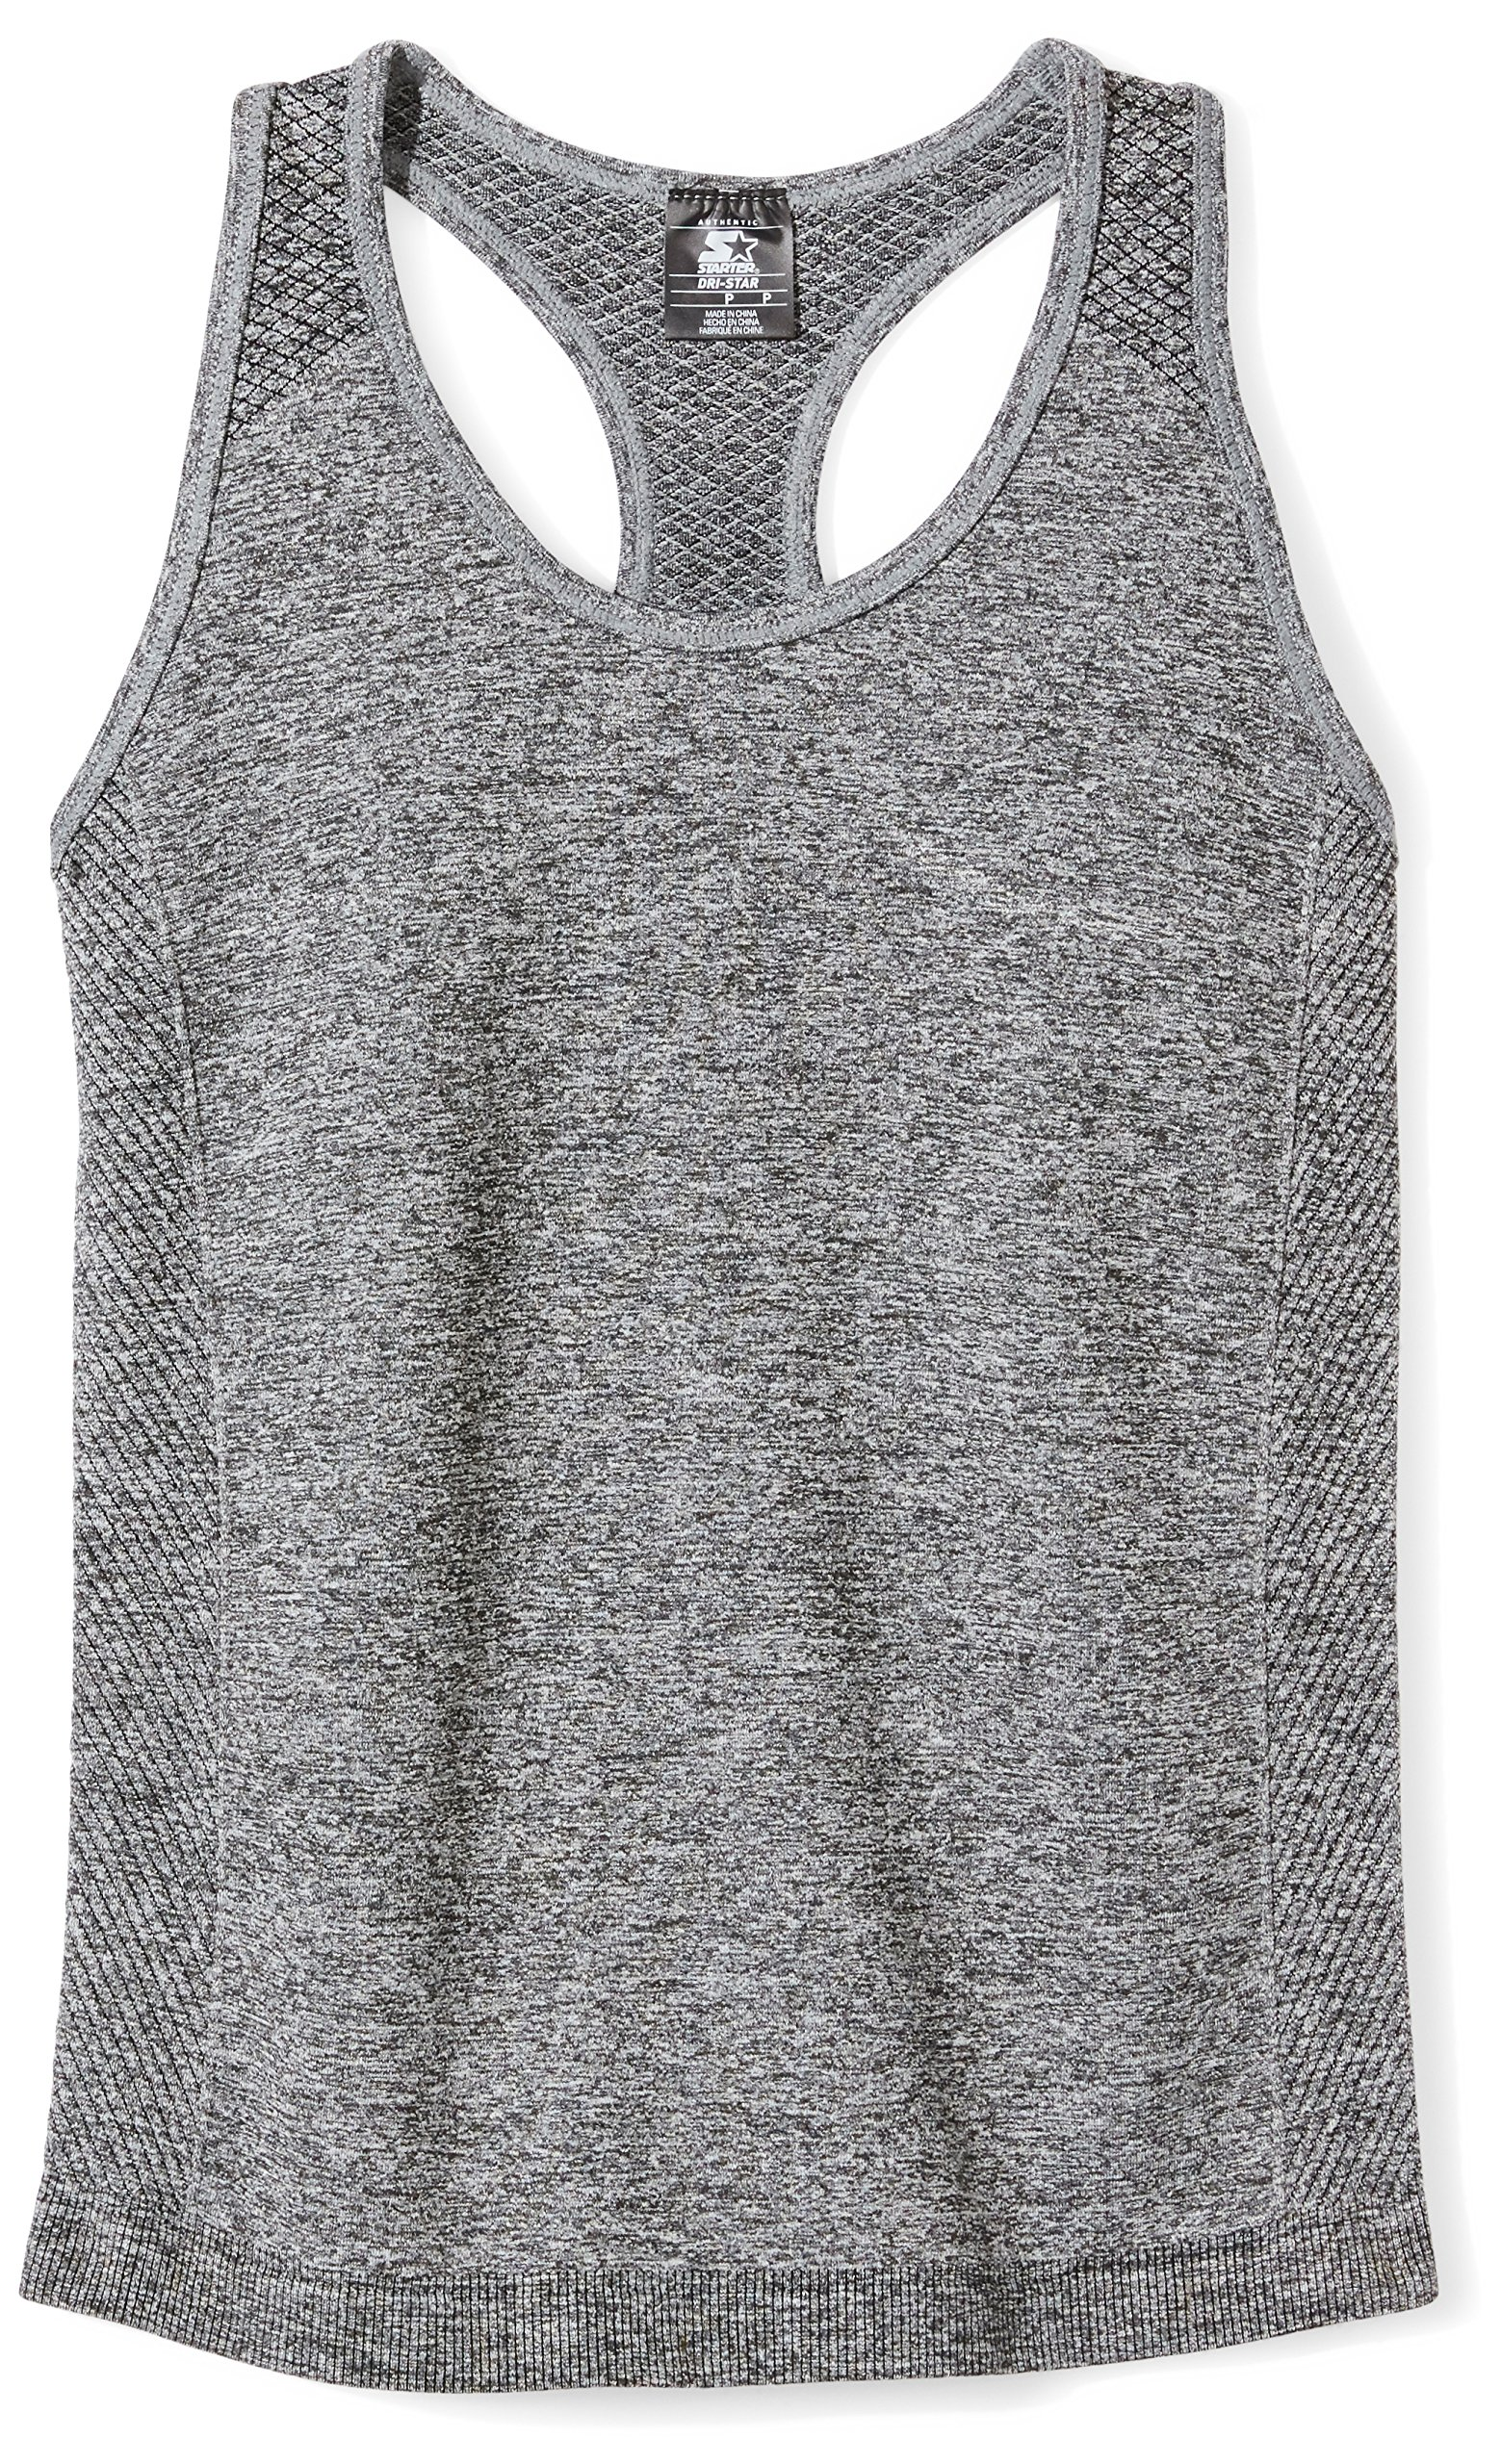 Starter Girls' Seamless Light-Compression Tank Top, Prime Exclusive, Iron Grey Jaspe, L (10/12)